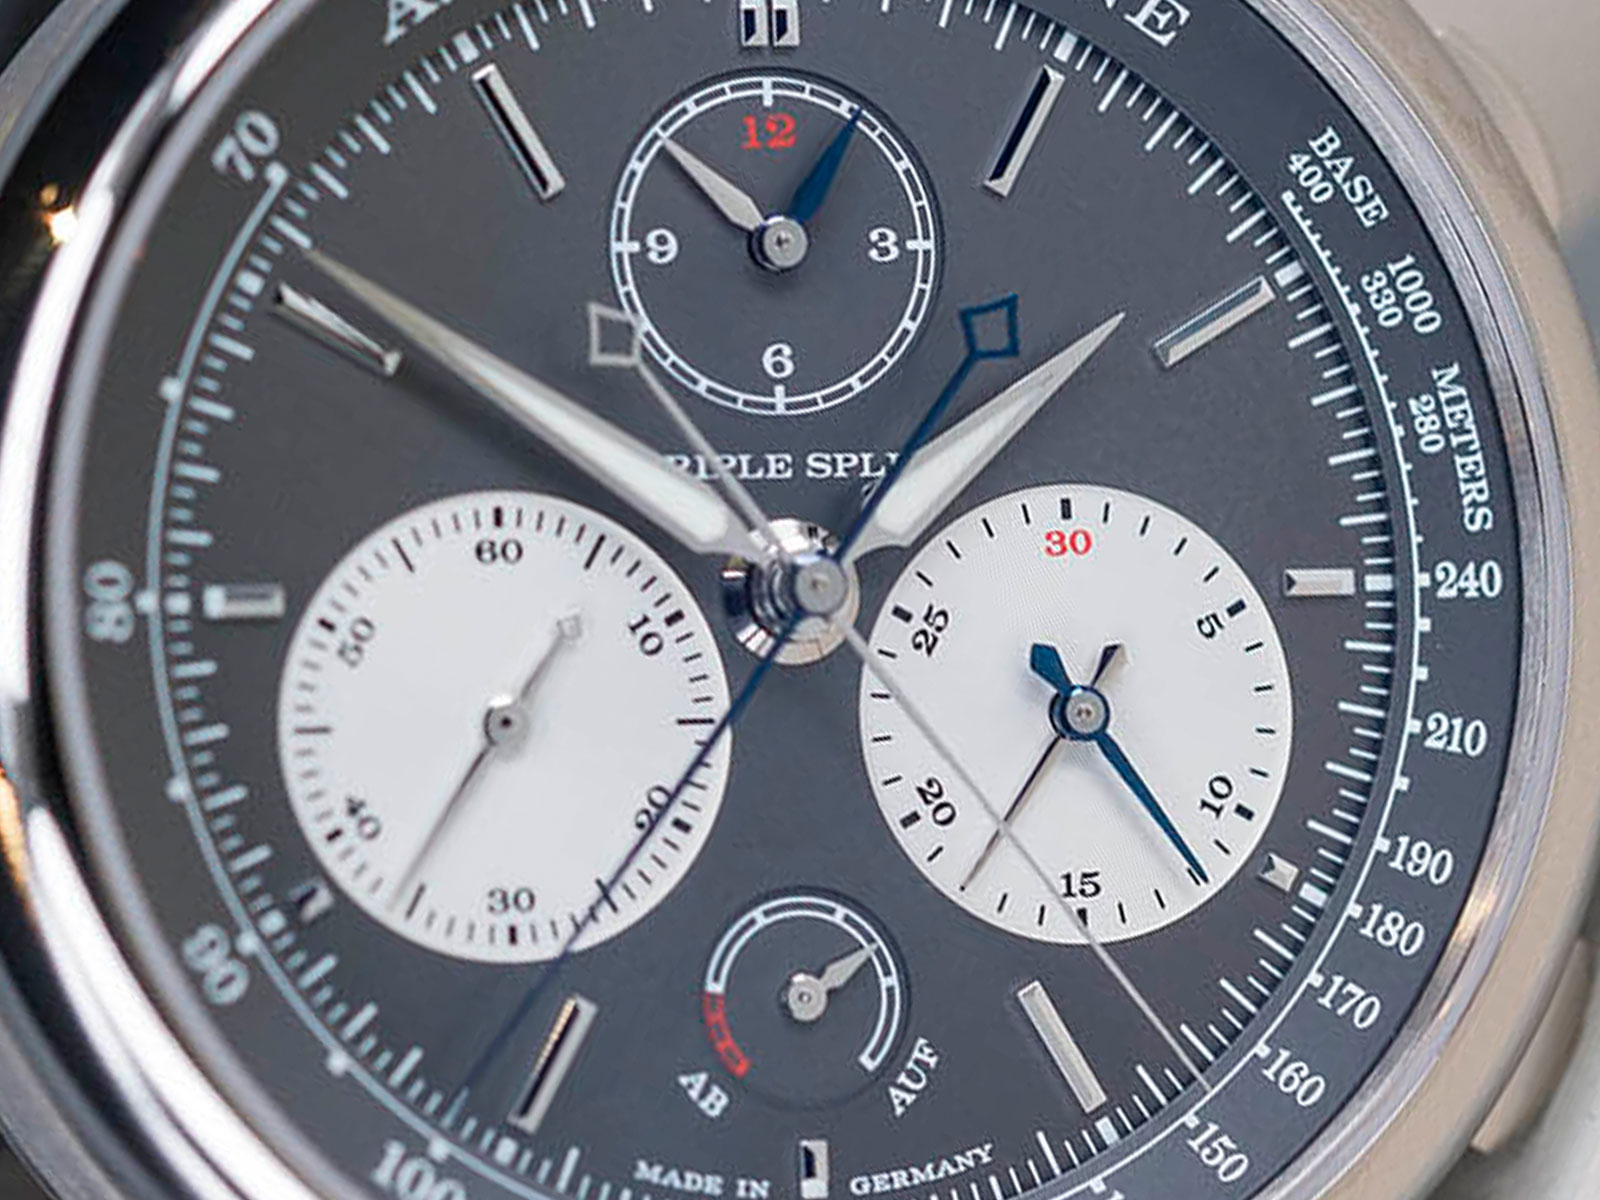 A-Lange-Sohne-424-038-P-1640913-Sihh2018-11.jpg